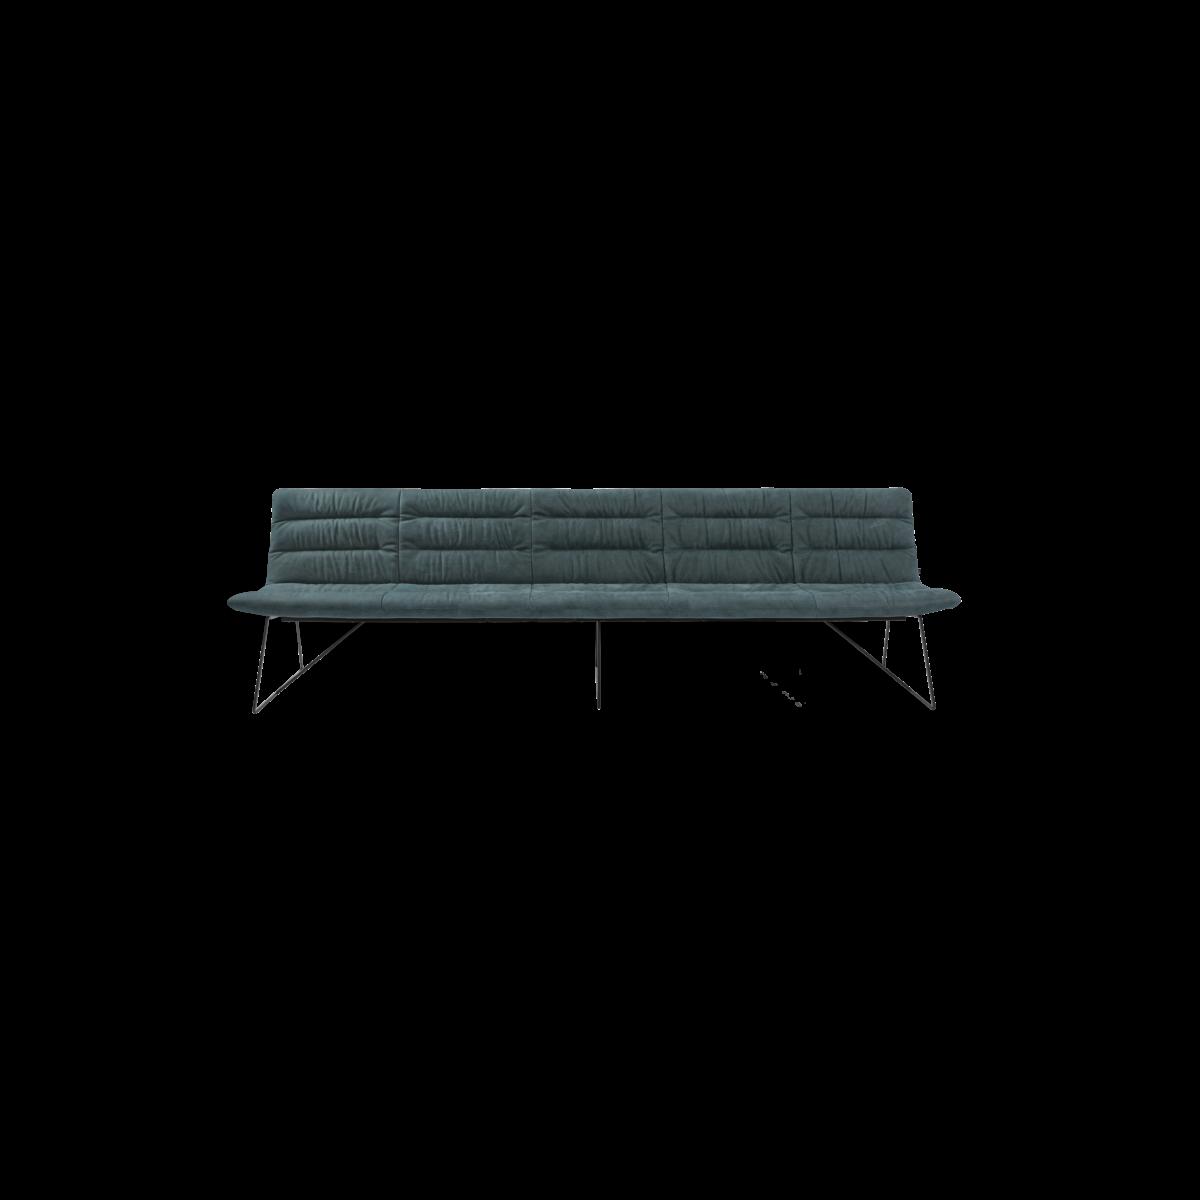 ARVA LIGHT BENCH 5er bench kuf oA pol turkis KFF  5 1200x1200 - Bancheta Arva Light KFF